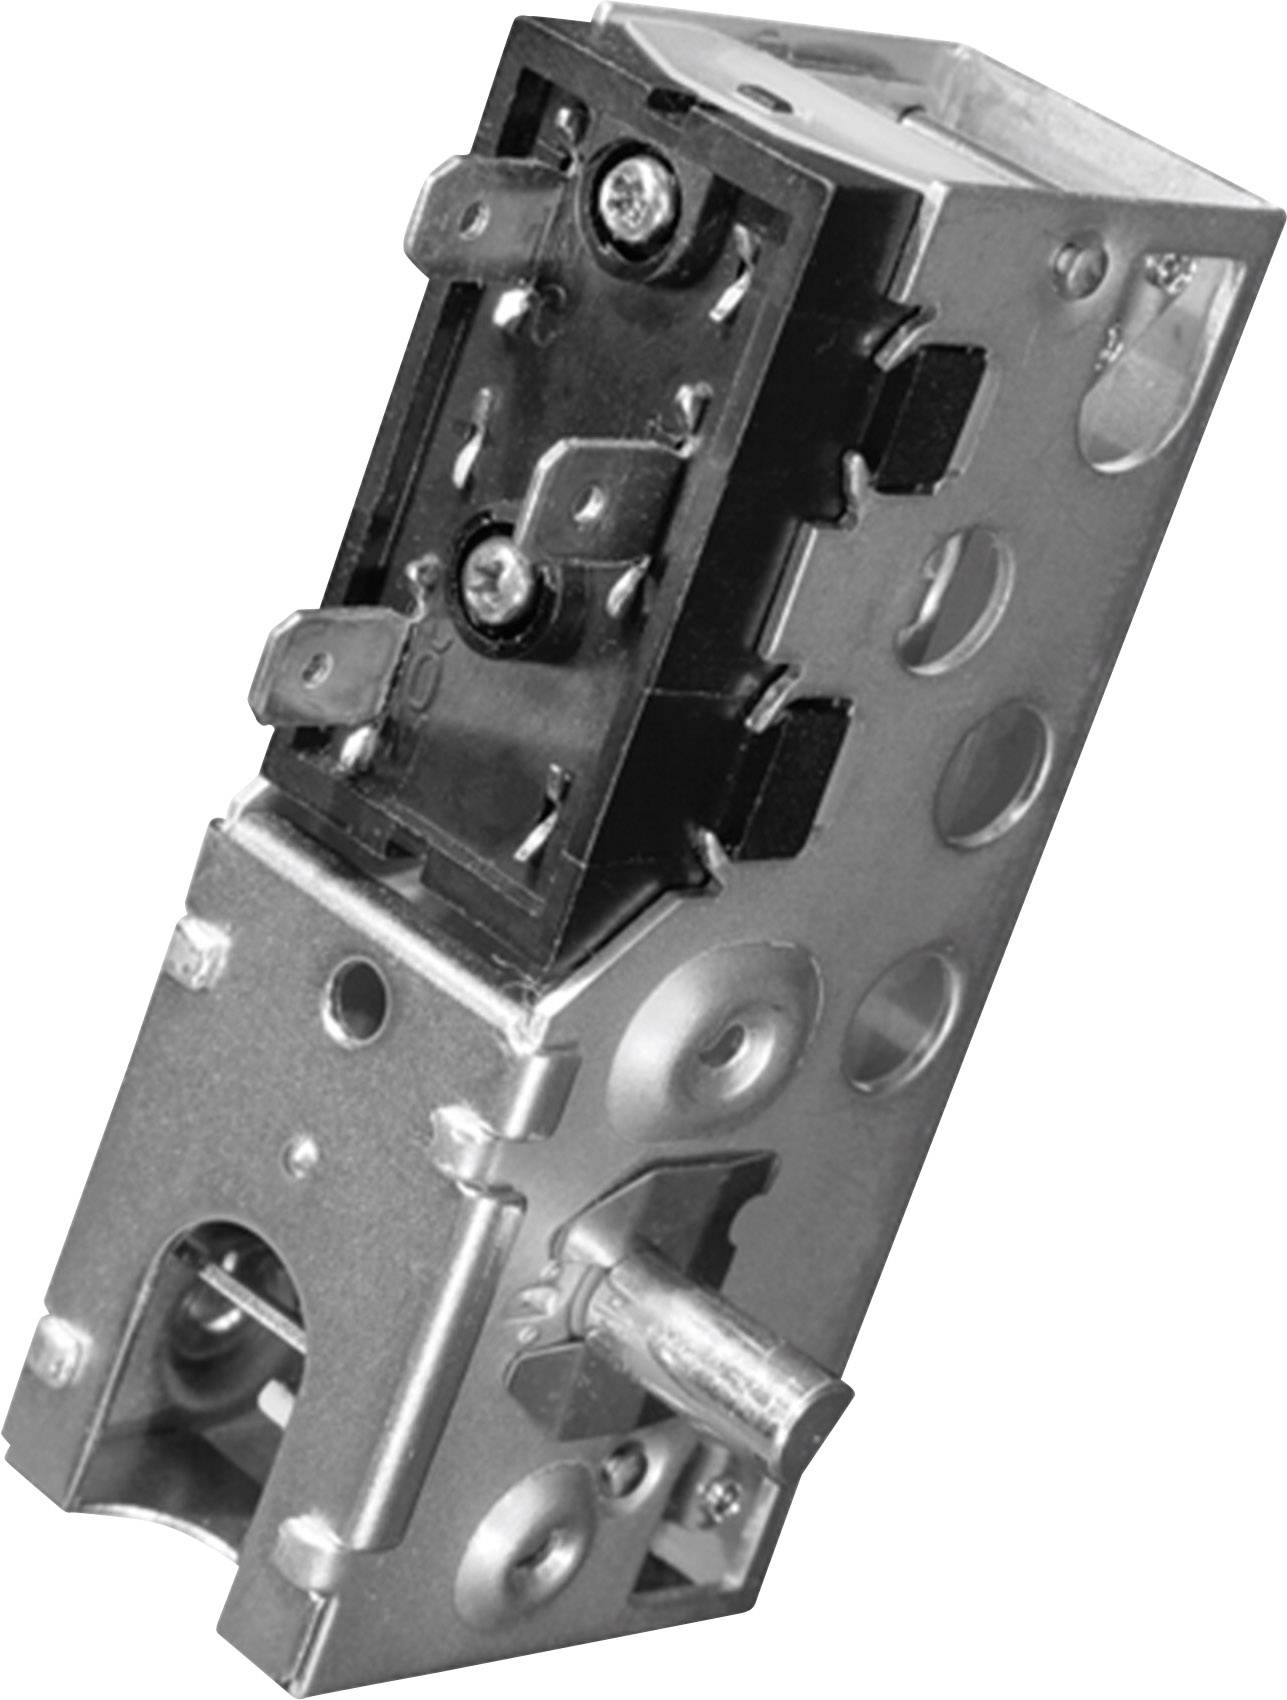 Regulátor vlhkosti B & B Thermo-Technik FEUCHTESCHALTER TW2001A, 10 - 80 % r., 10 - 40 °C